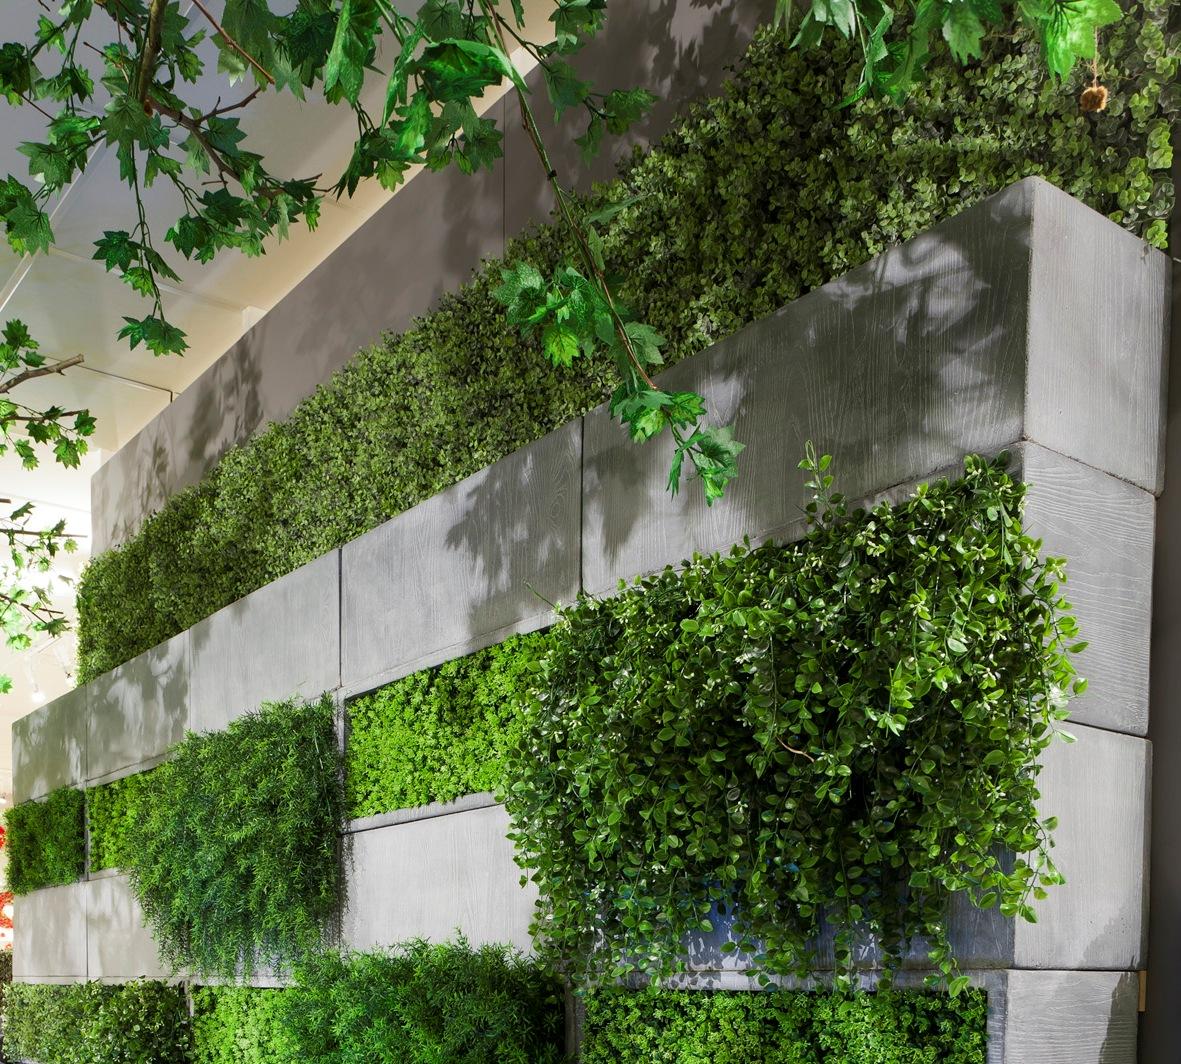 Un jard n vertical artificial - Jardin vertical interior ...